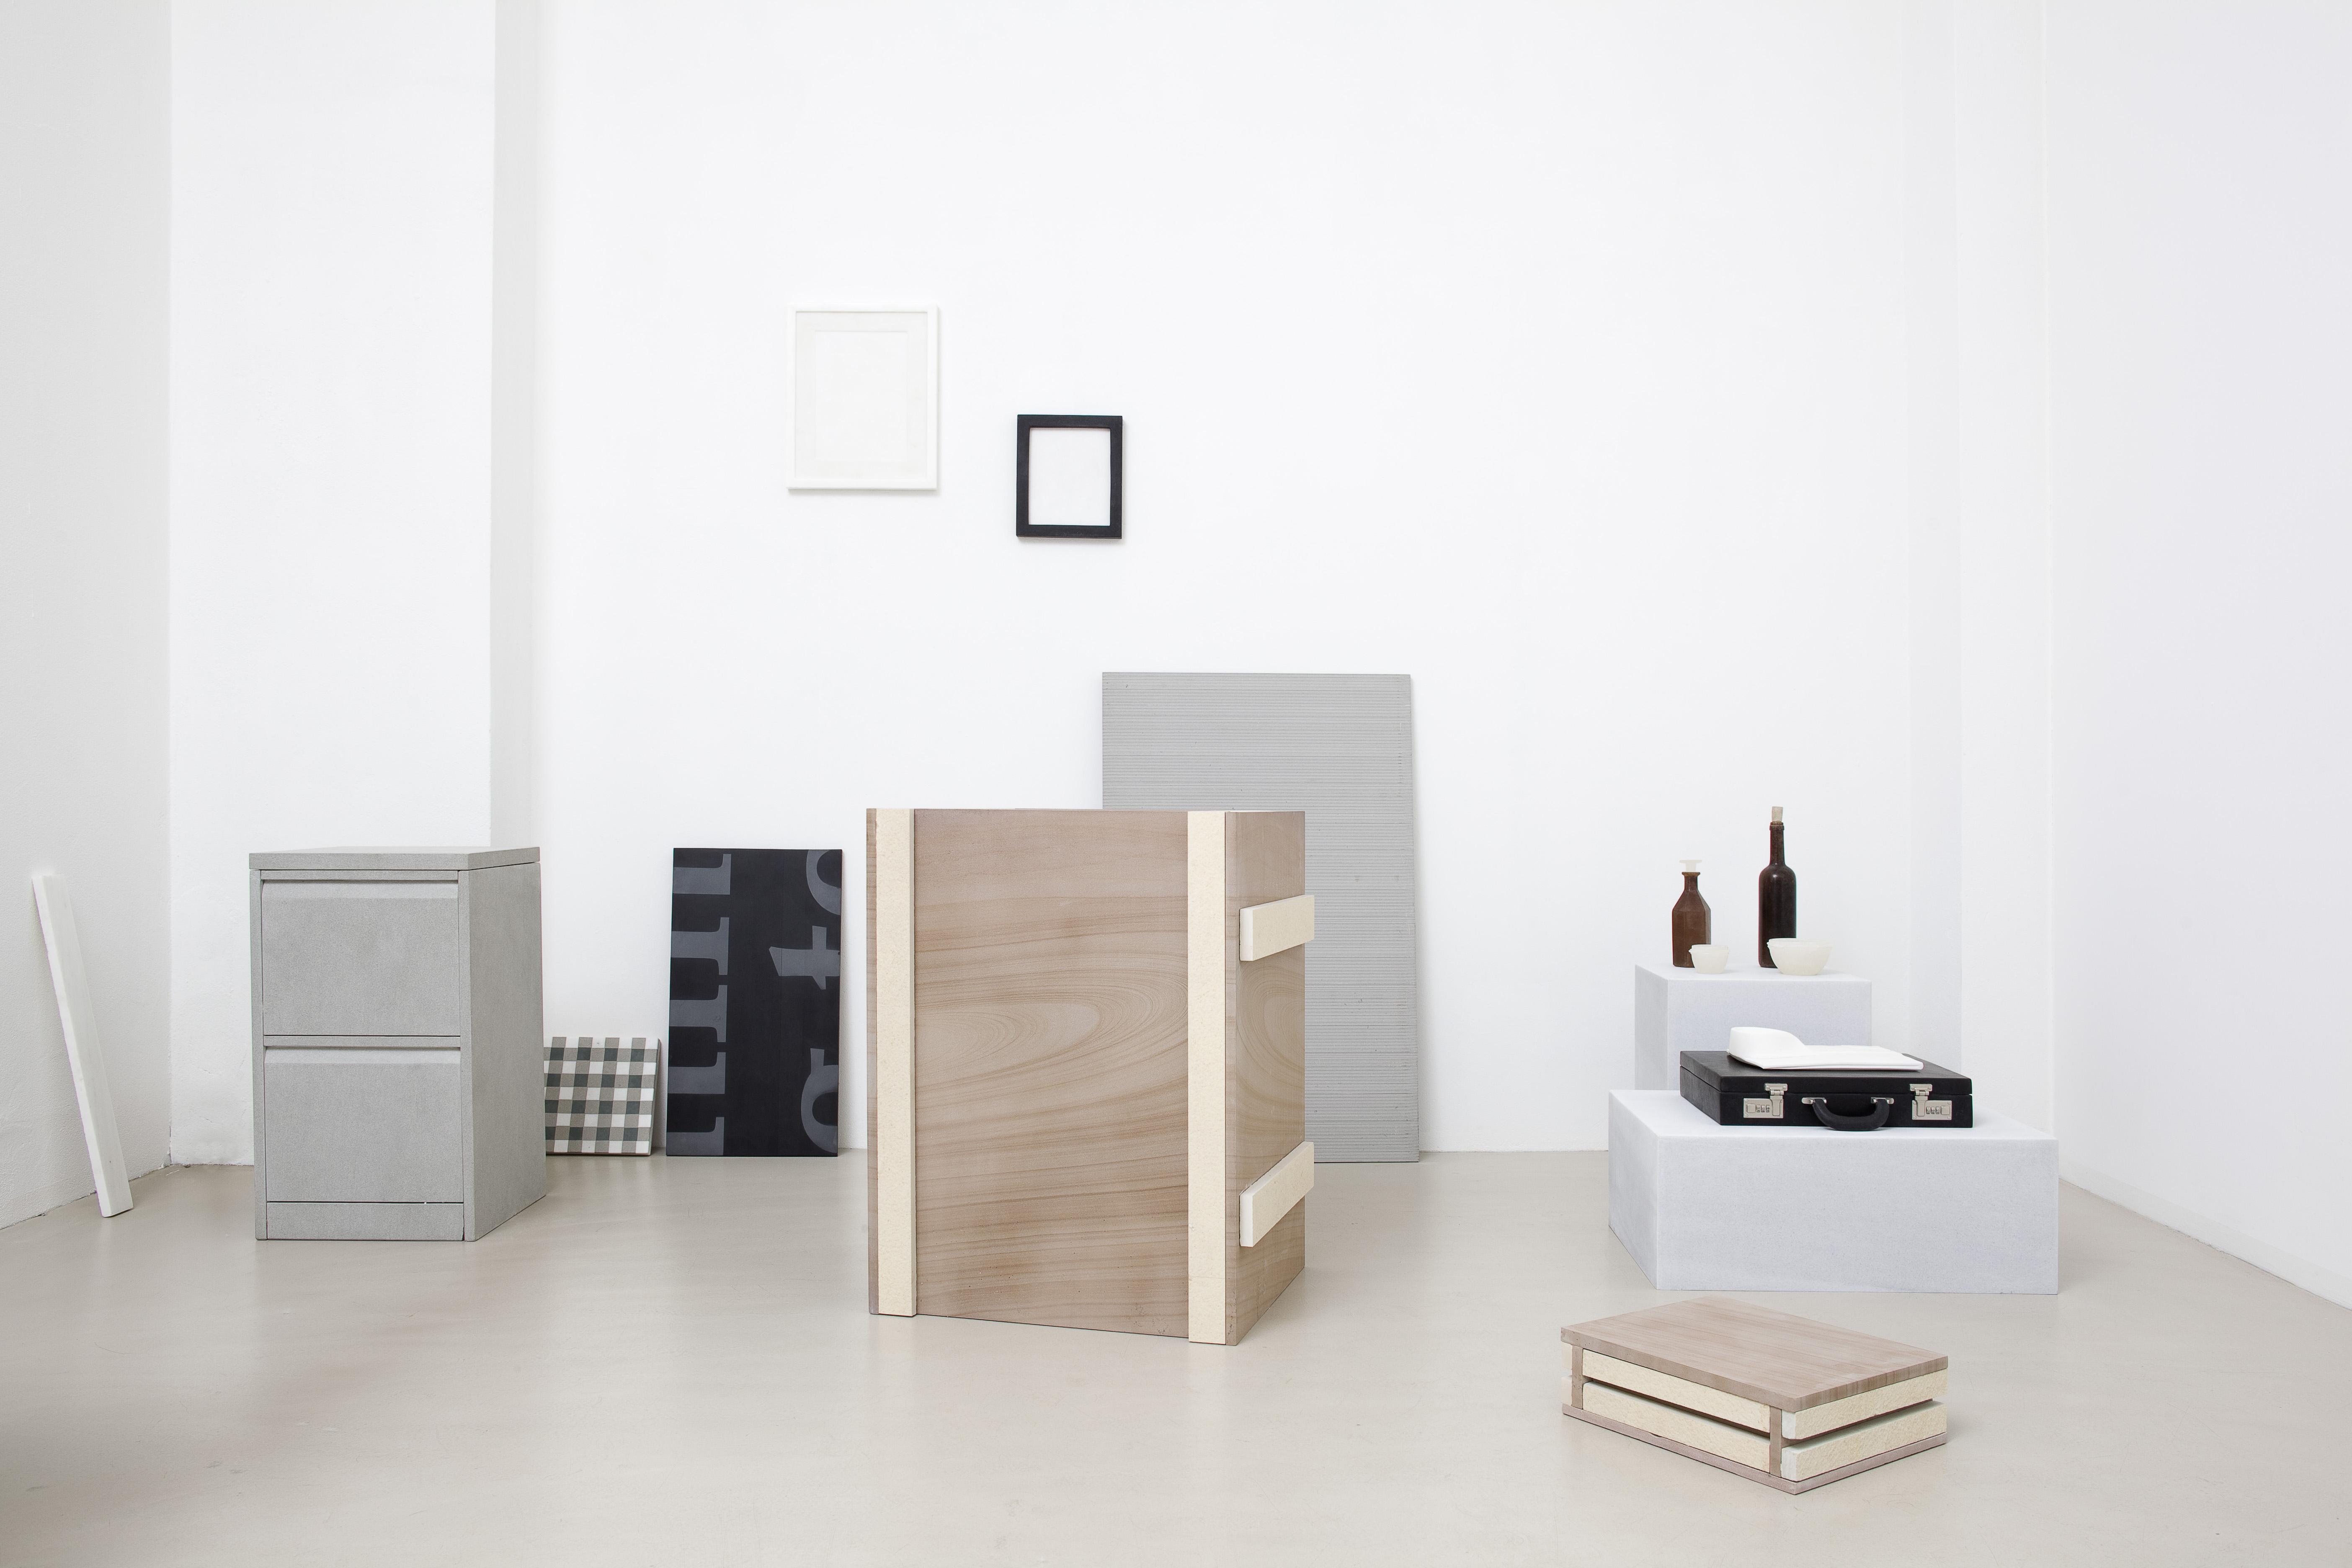 ´Shadows of words spoken´(2010). Installation View, Gallery Christia Ehrentraut